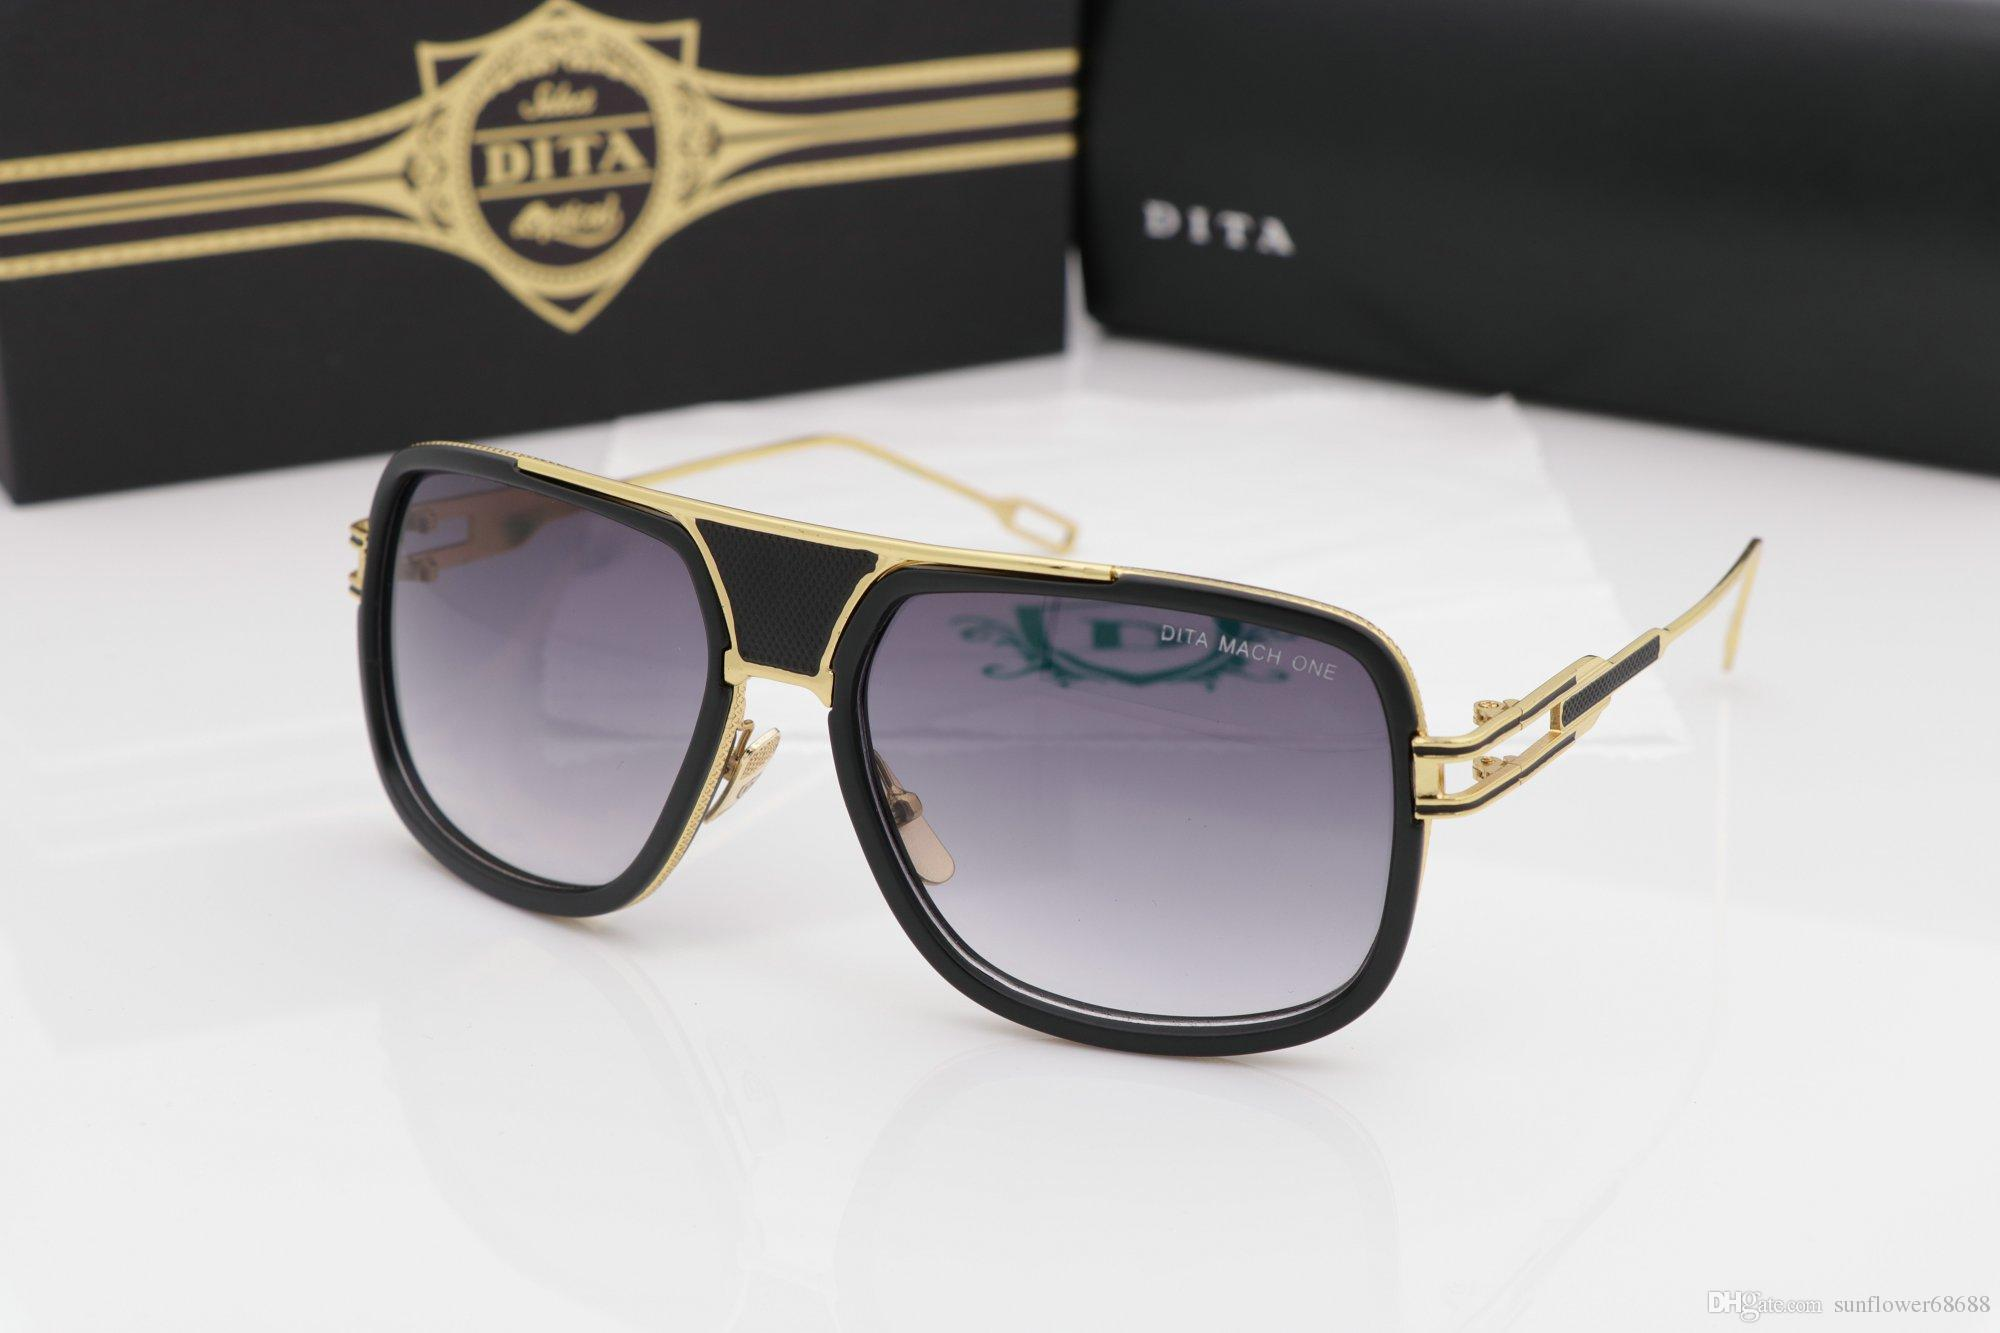 9550a43d1061 2017 Brand Grandmaster Five 5 Sunglasses DRX 2077 Black Gold Dark ...